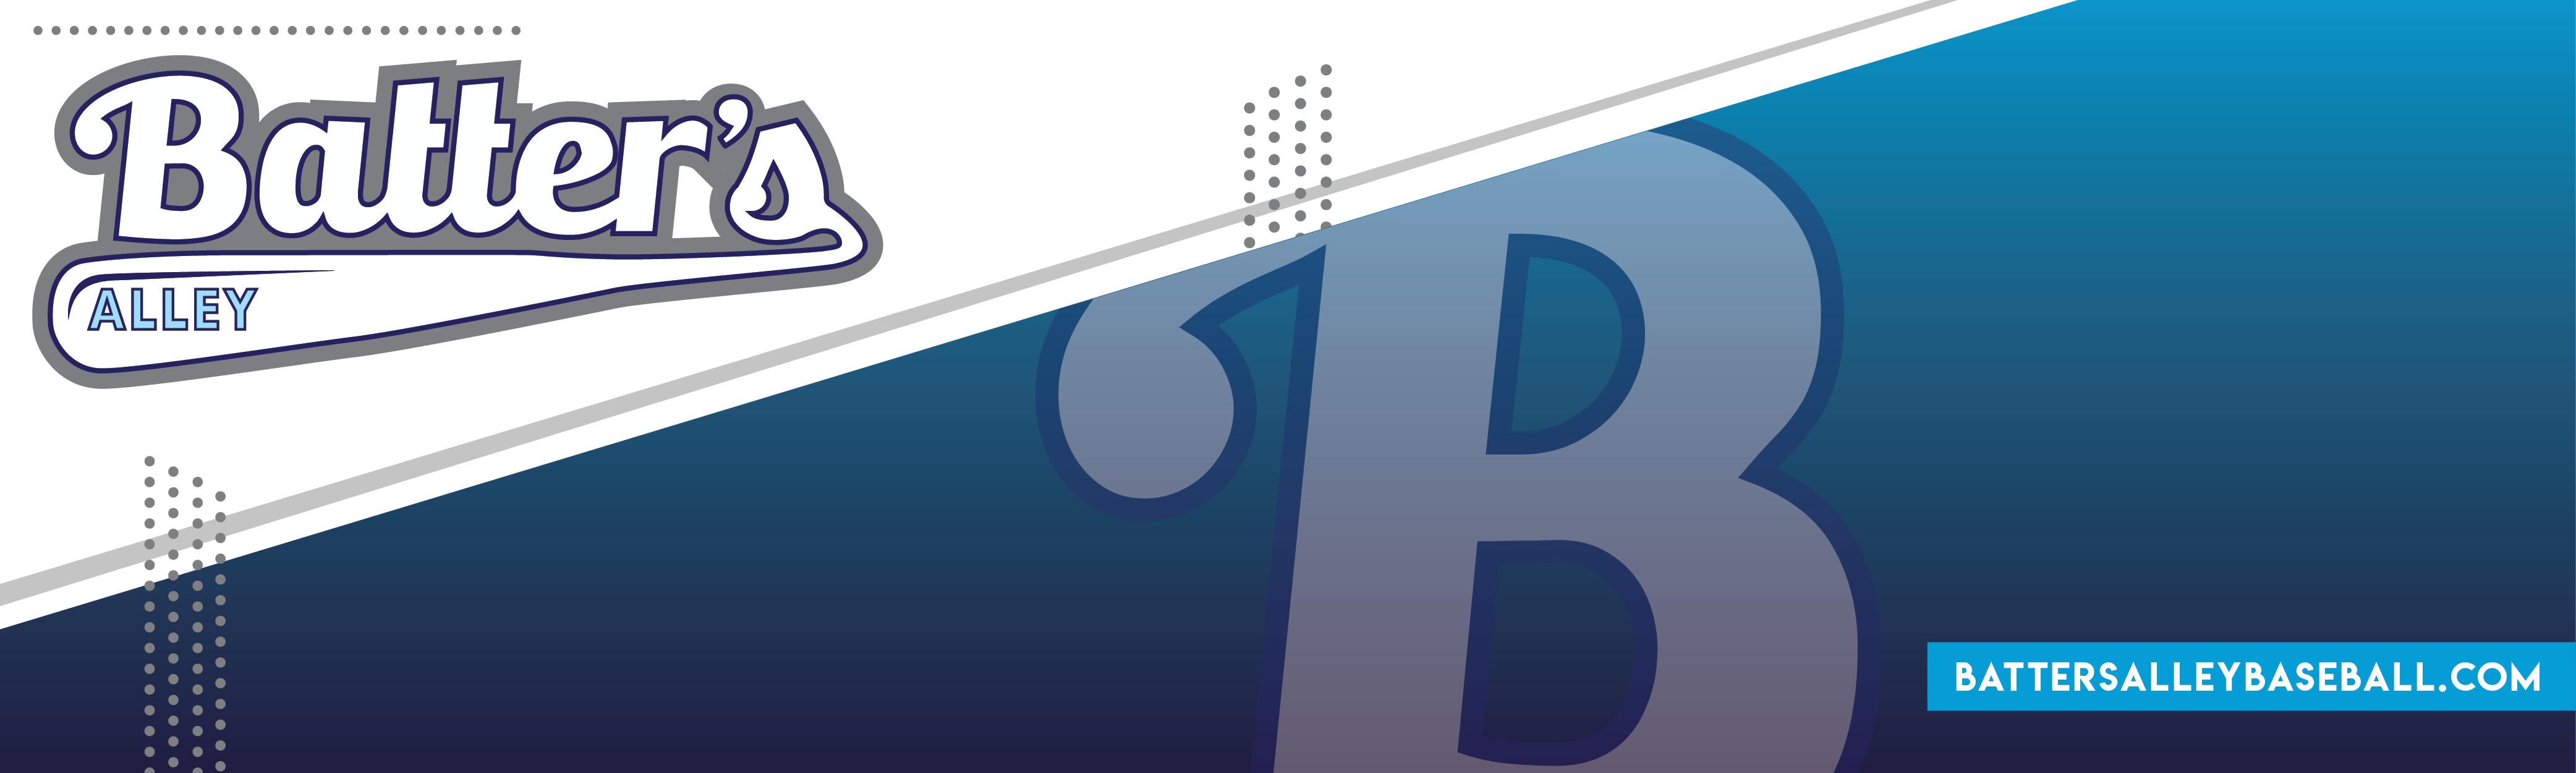 Babc banner 01